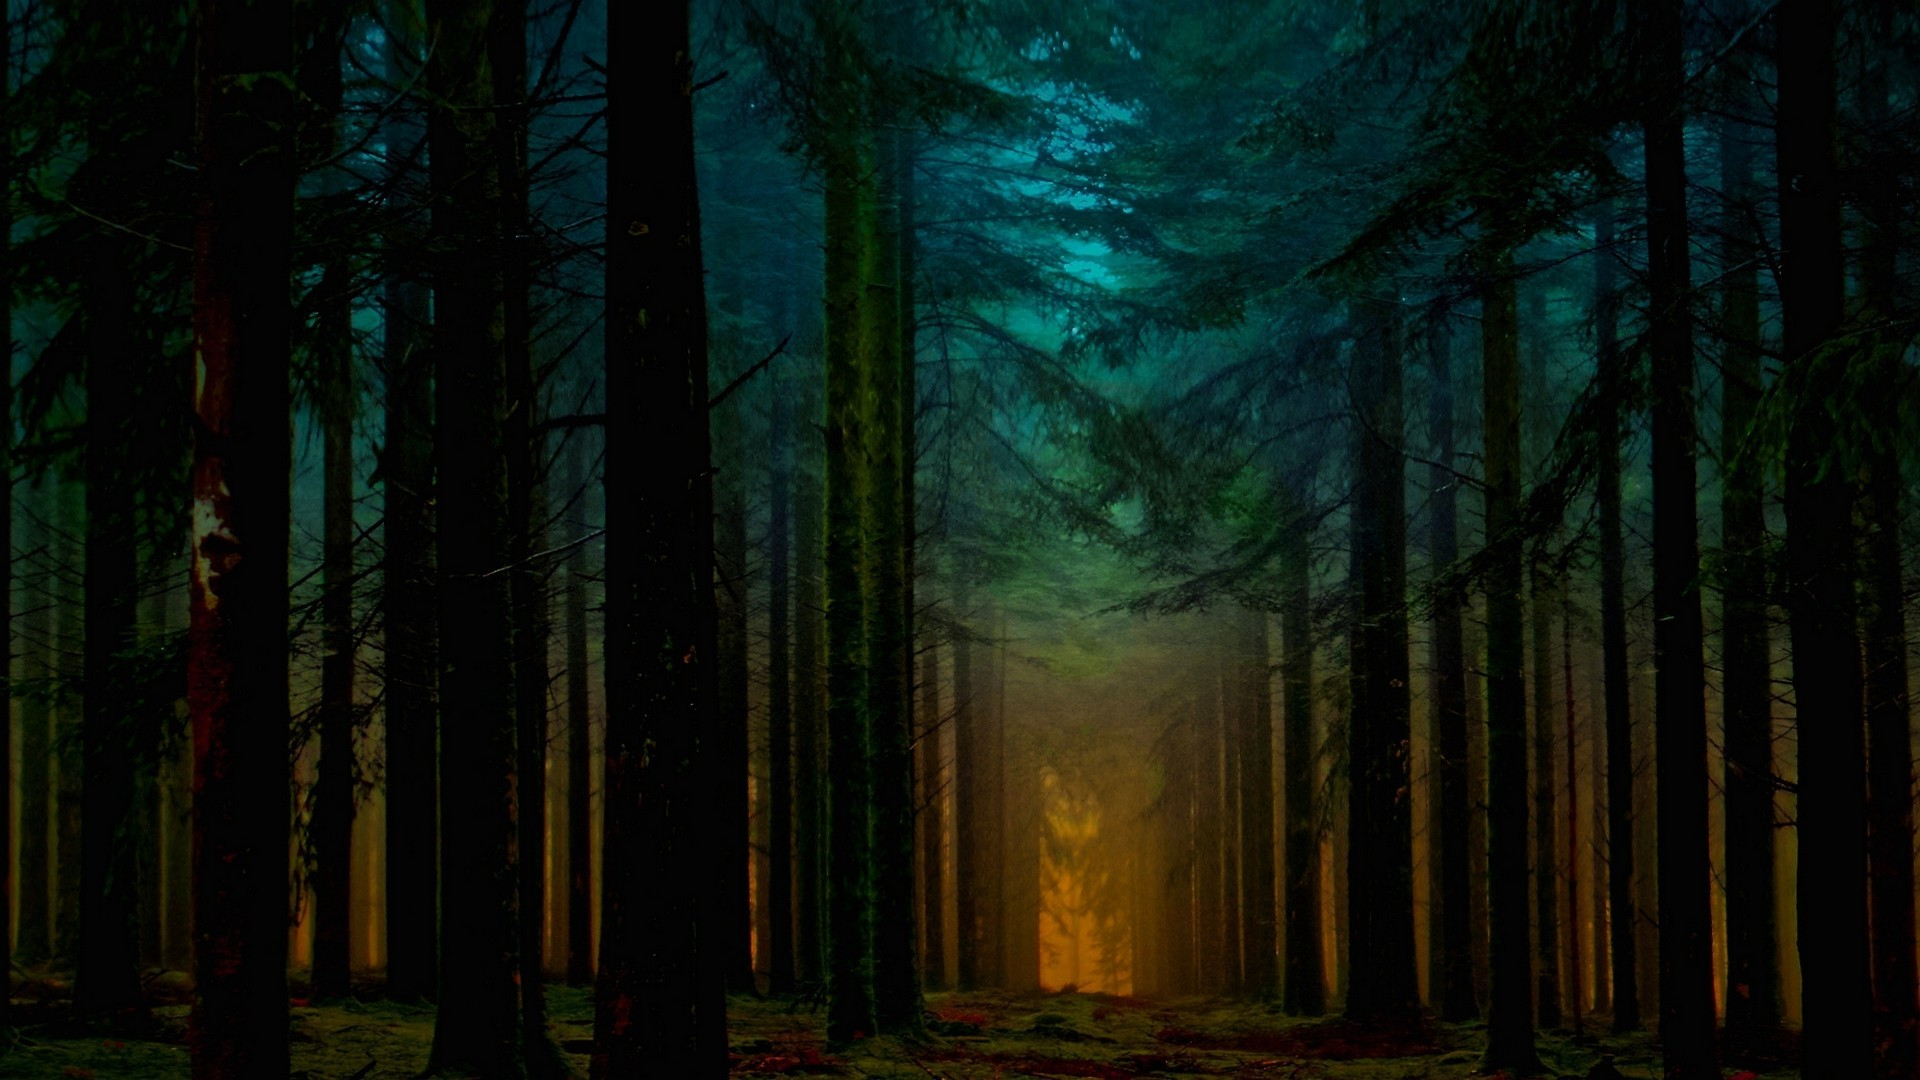 Wallpaper Hutan 3d Landscape Nature Forest Mist Path Sunlight Trees